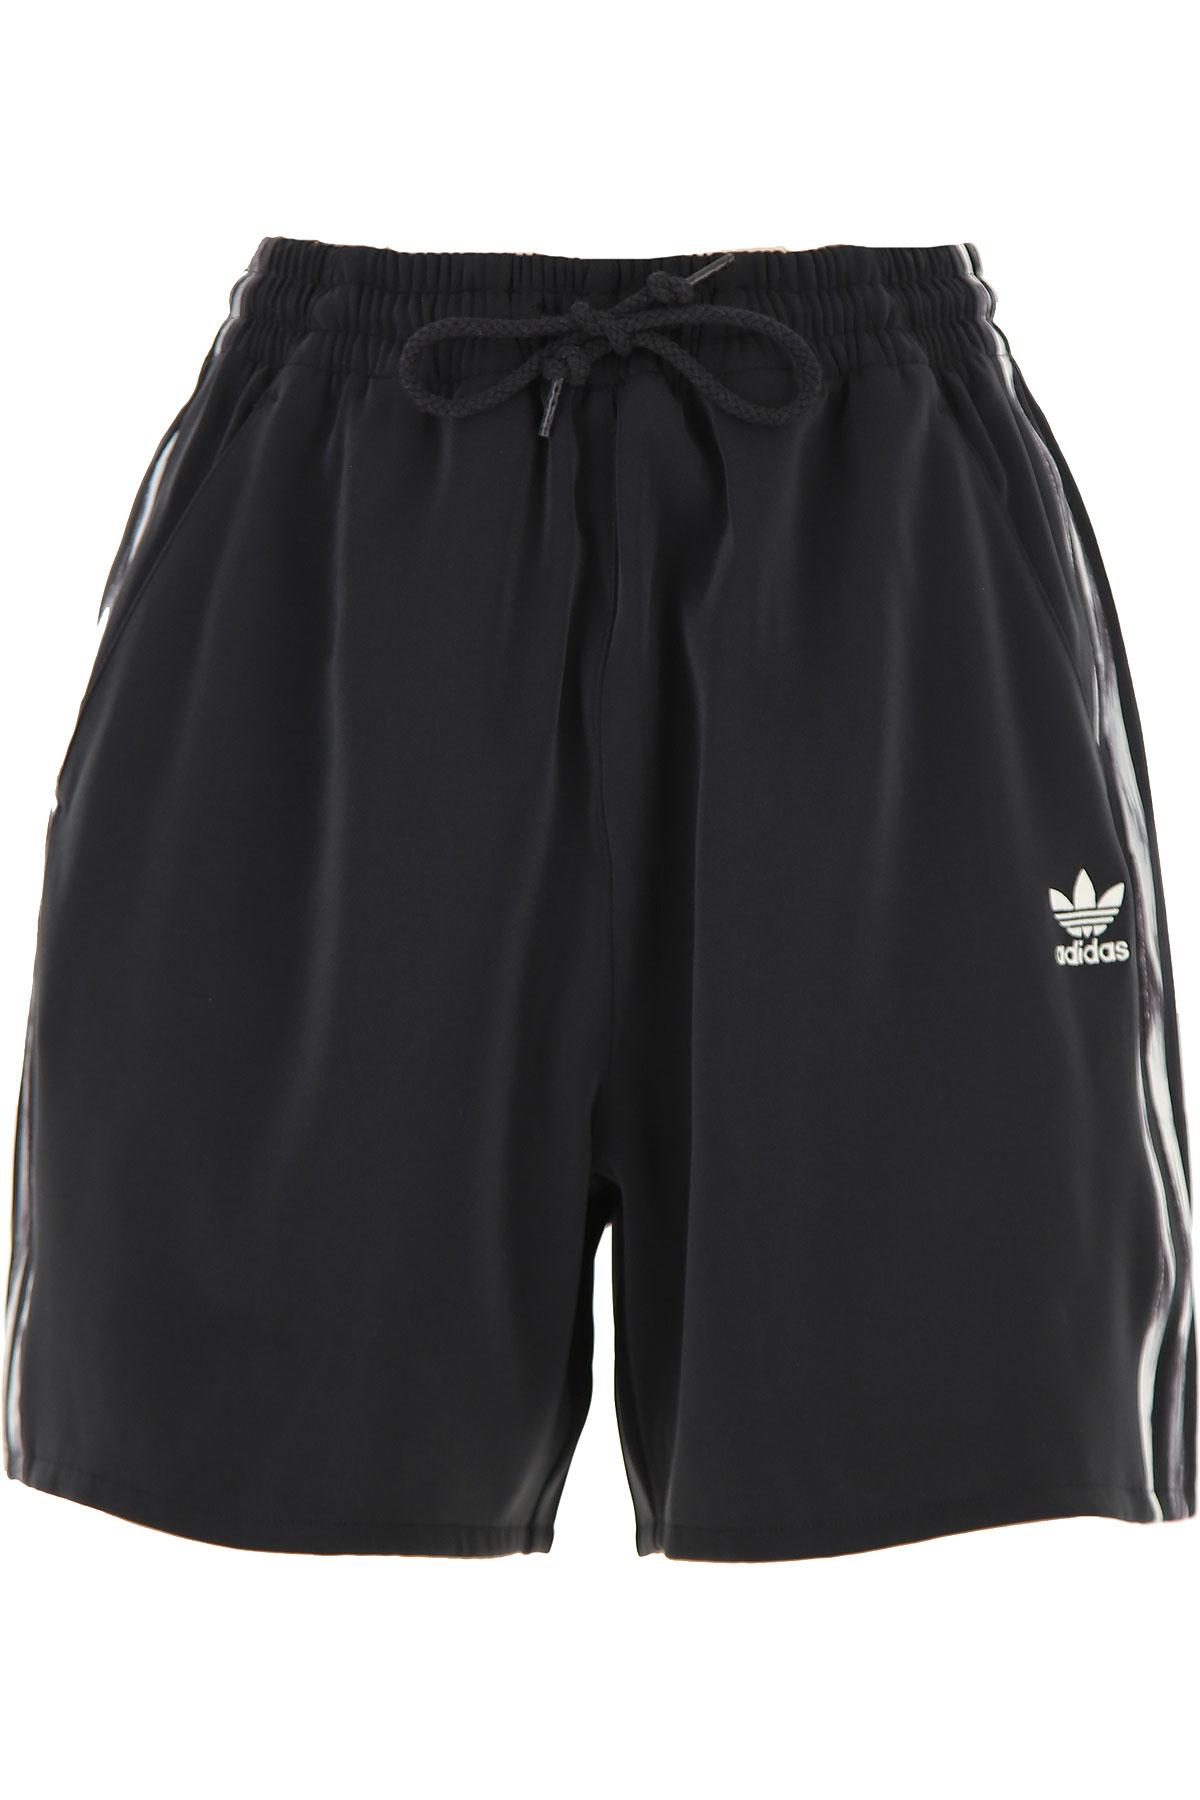 ADIDAS Hosen   Adidas Damenbekleidung, Schwarz, Polyester